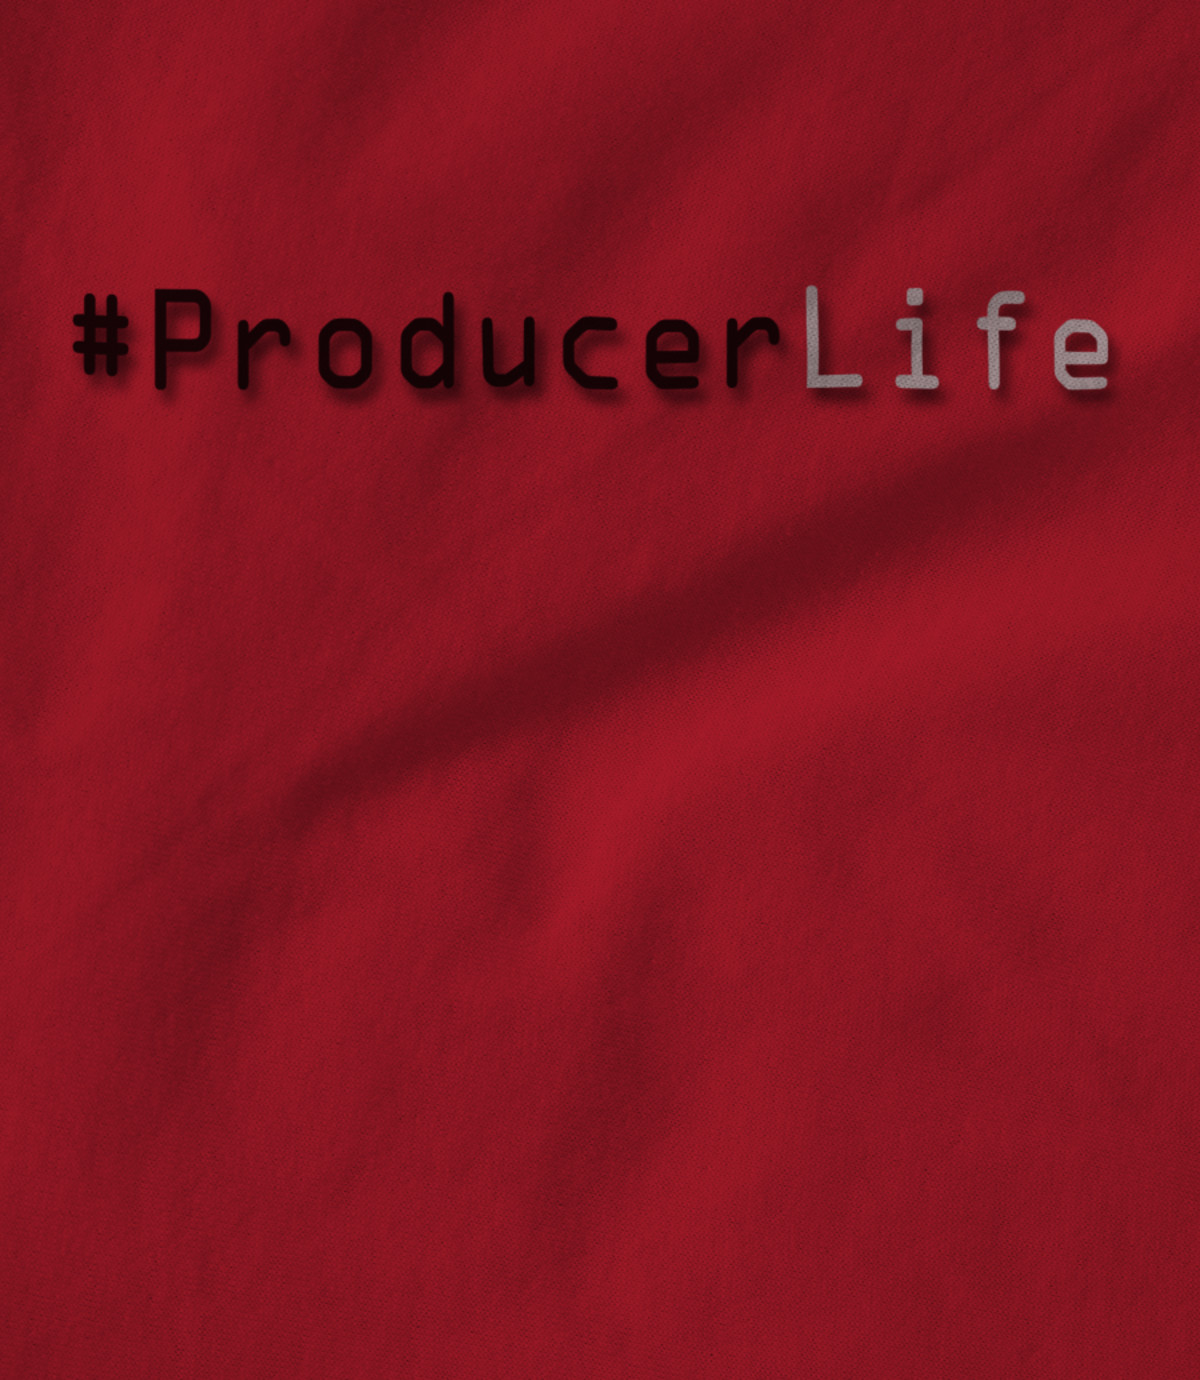 Tmsd  producerlife 4 1543862571